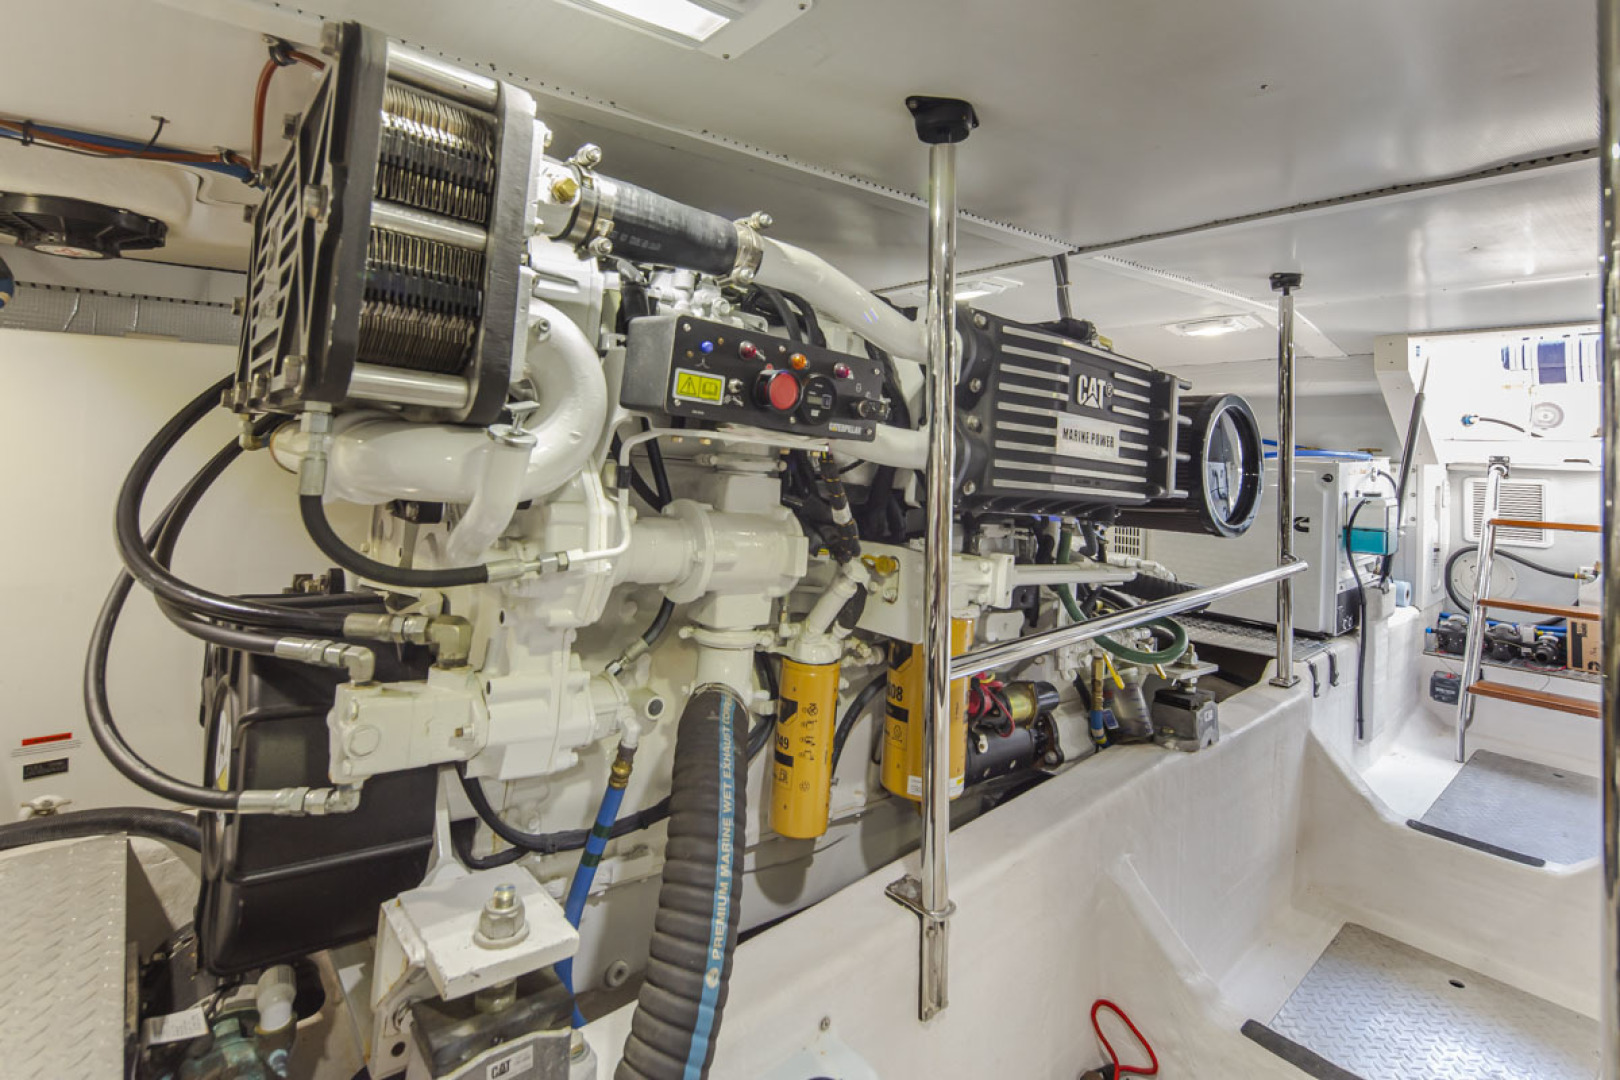 Sabre-Salon Express 2009-M&Ms Seattle-Washington-United States-Engine Room-1618477 | Thumbnail